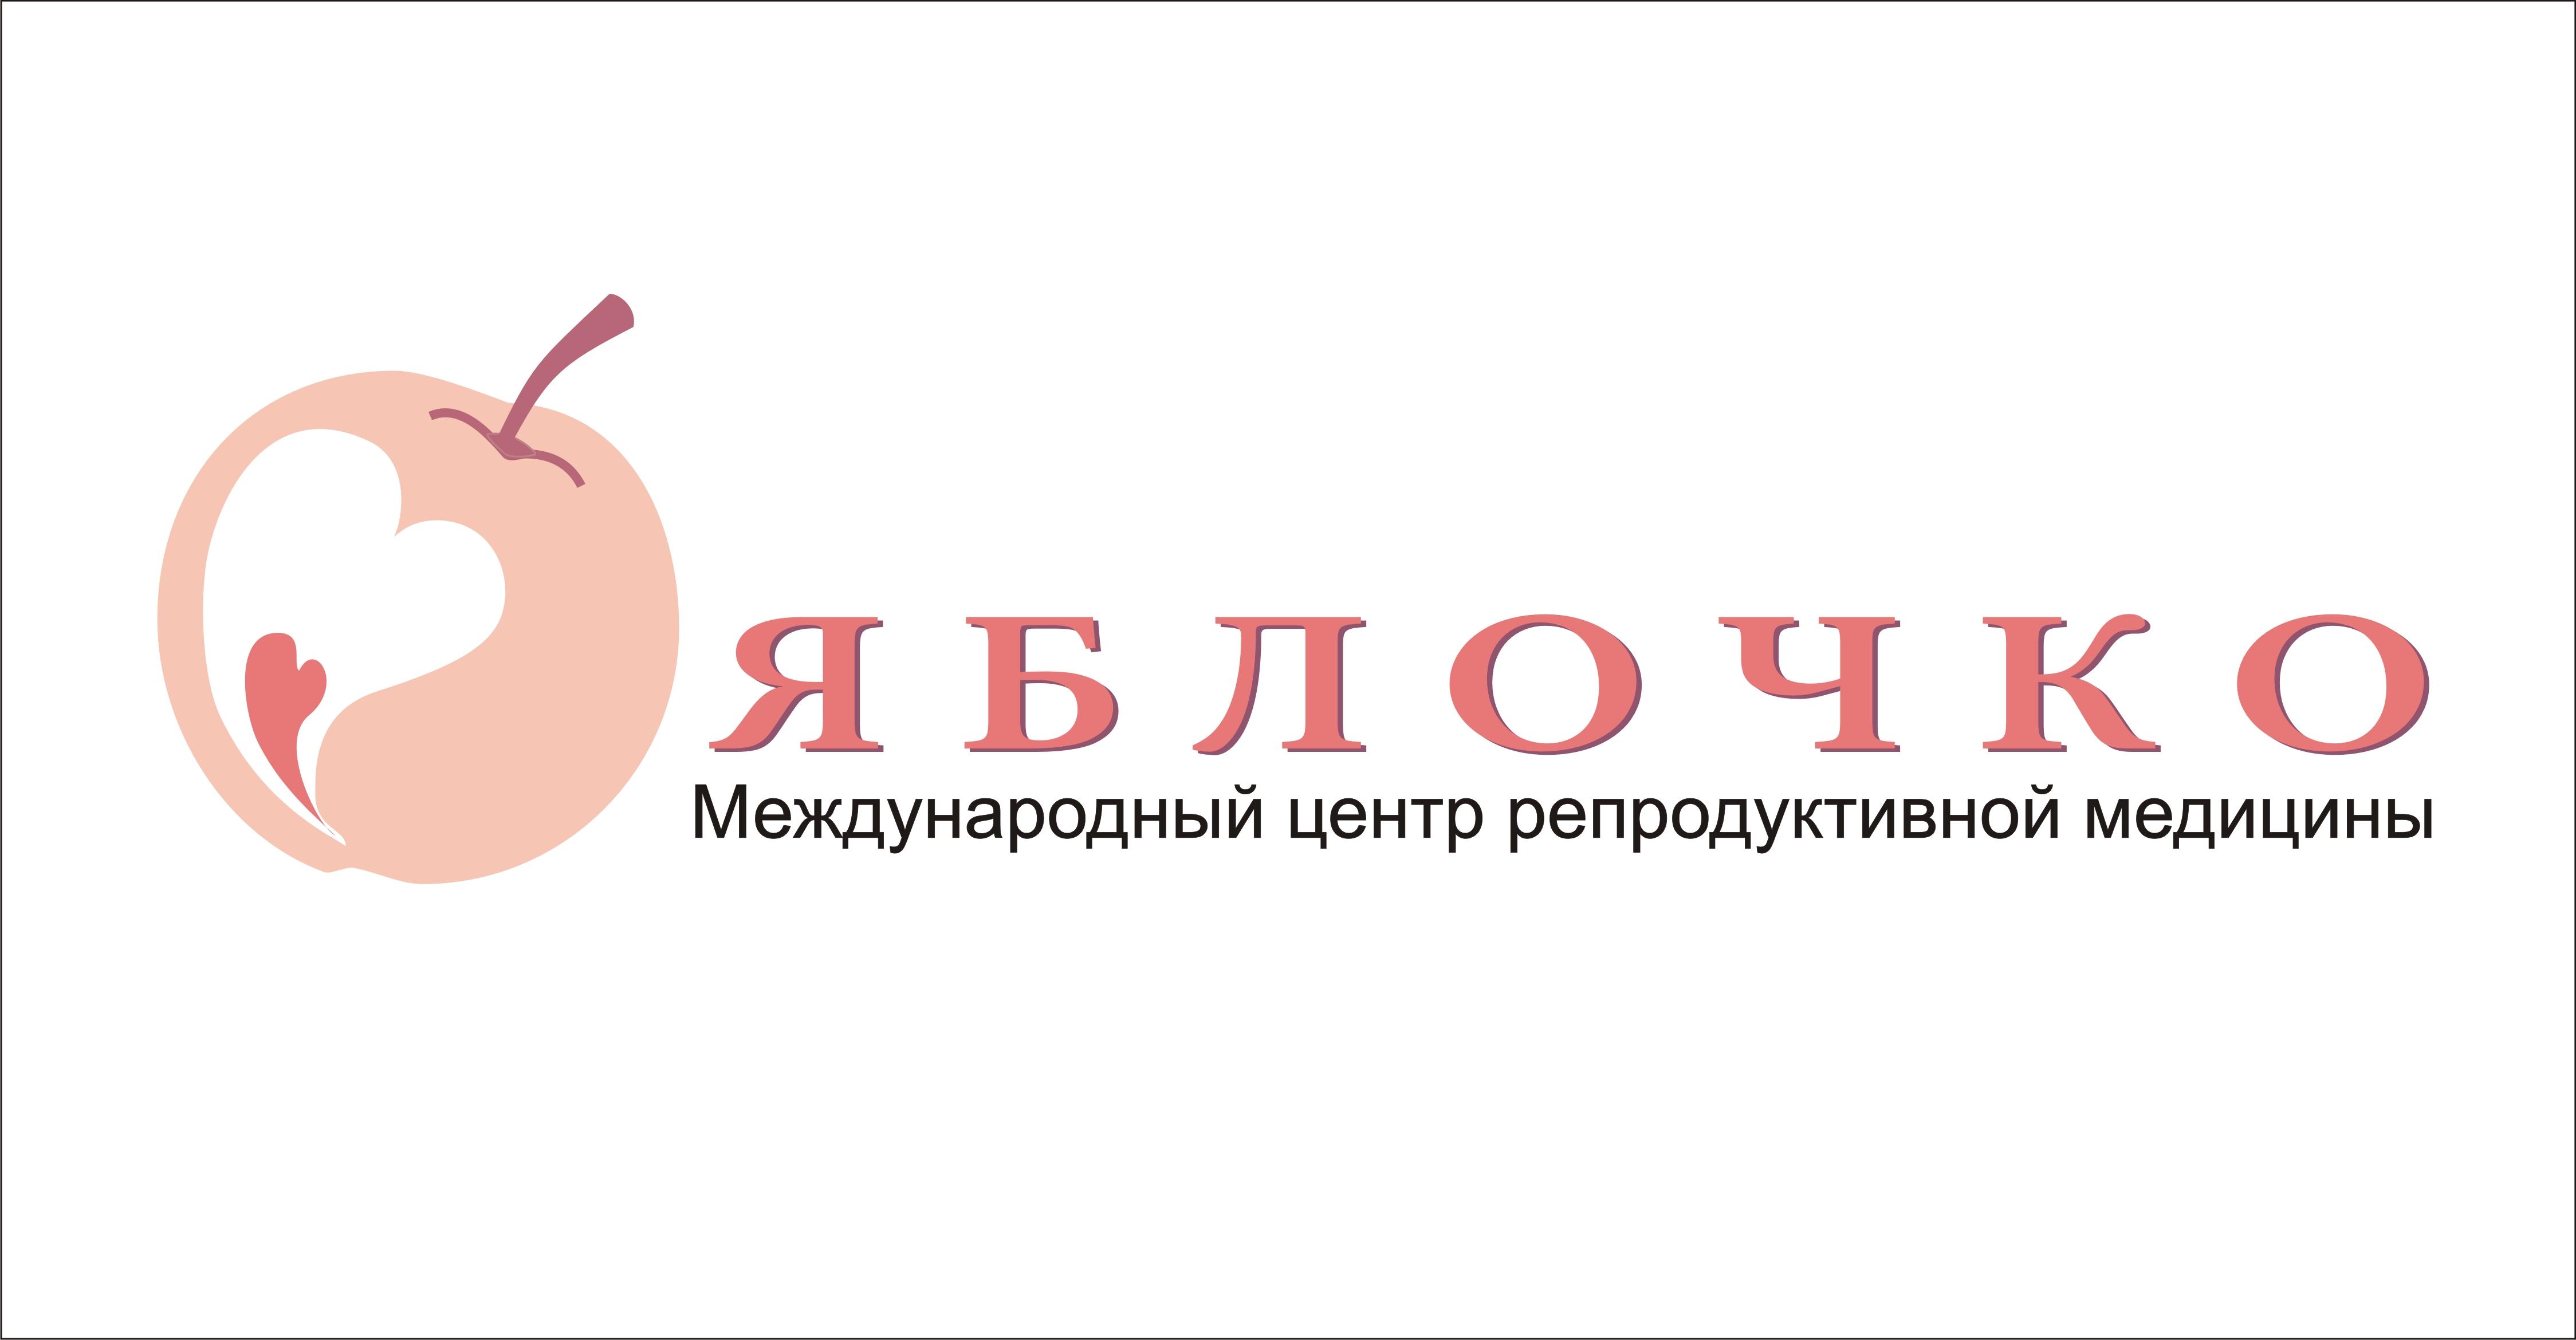 Нейминг+Логотип фото f_91358fba0f438505.jpg